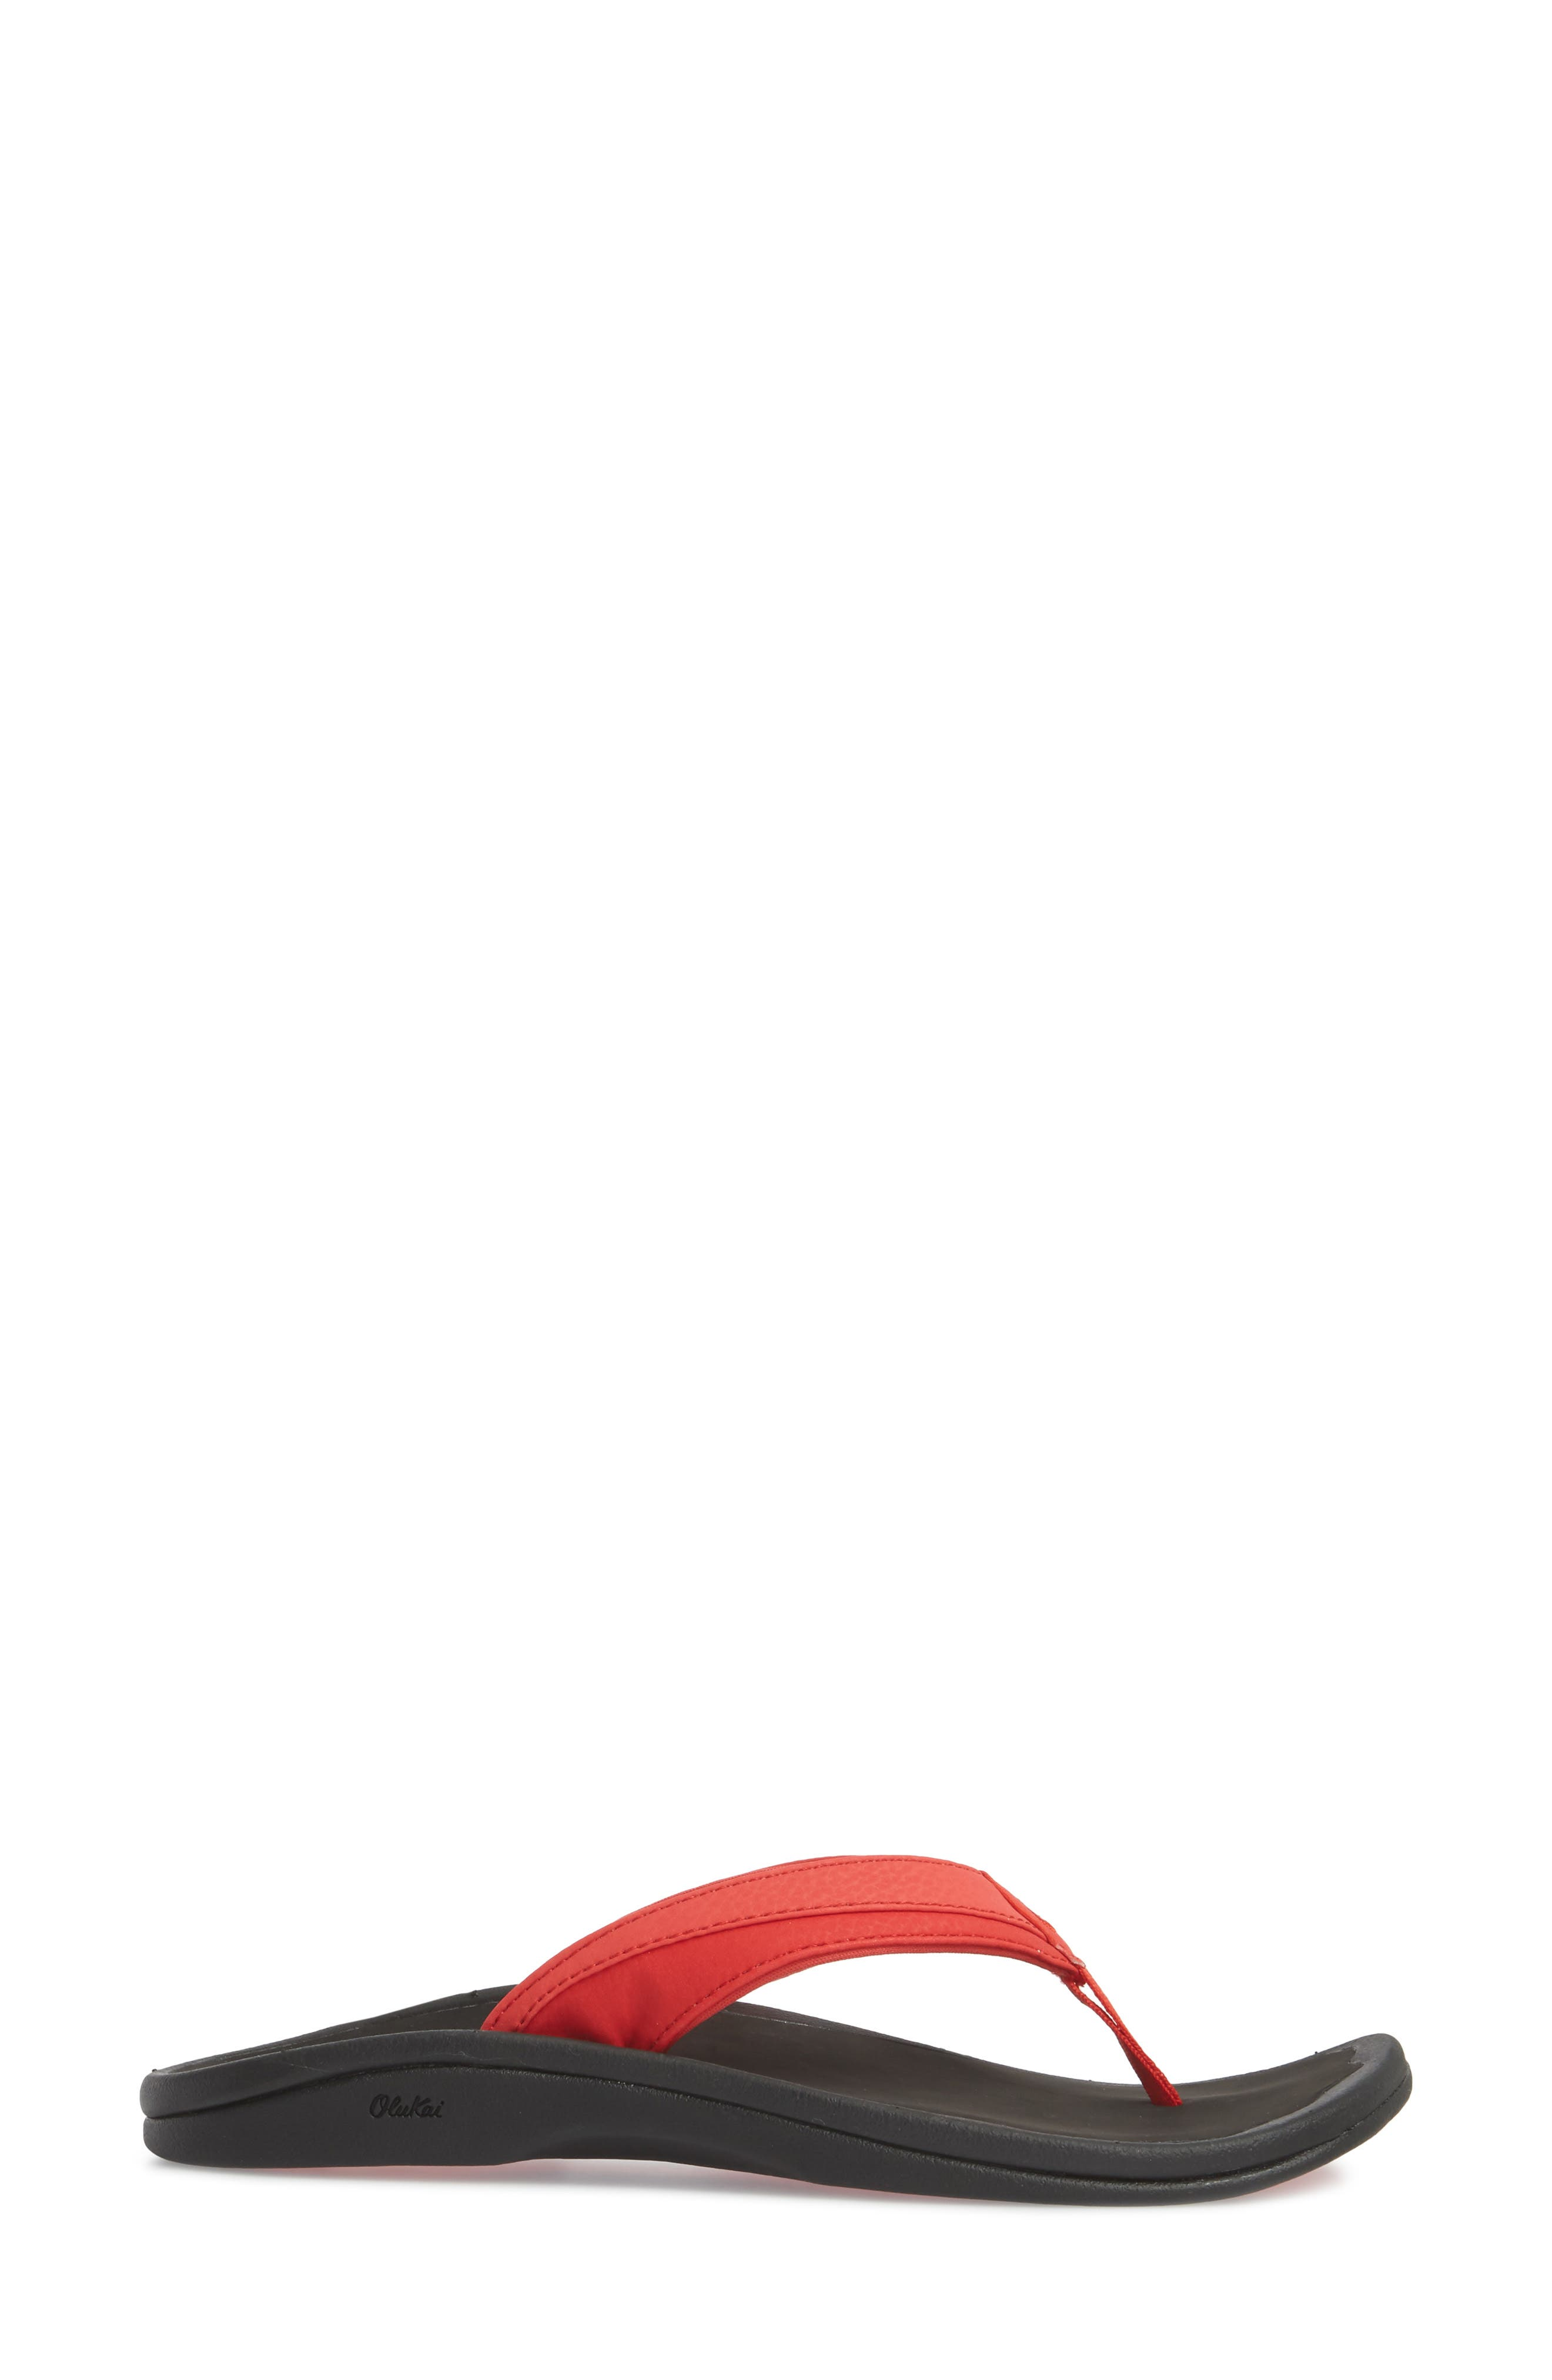 Alternate Image 3  - OluKai 'Ohana' Sandal (Women)